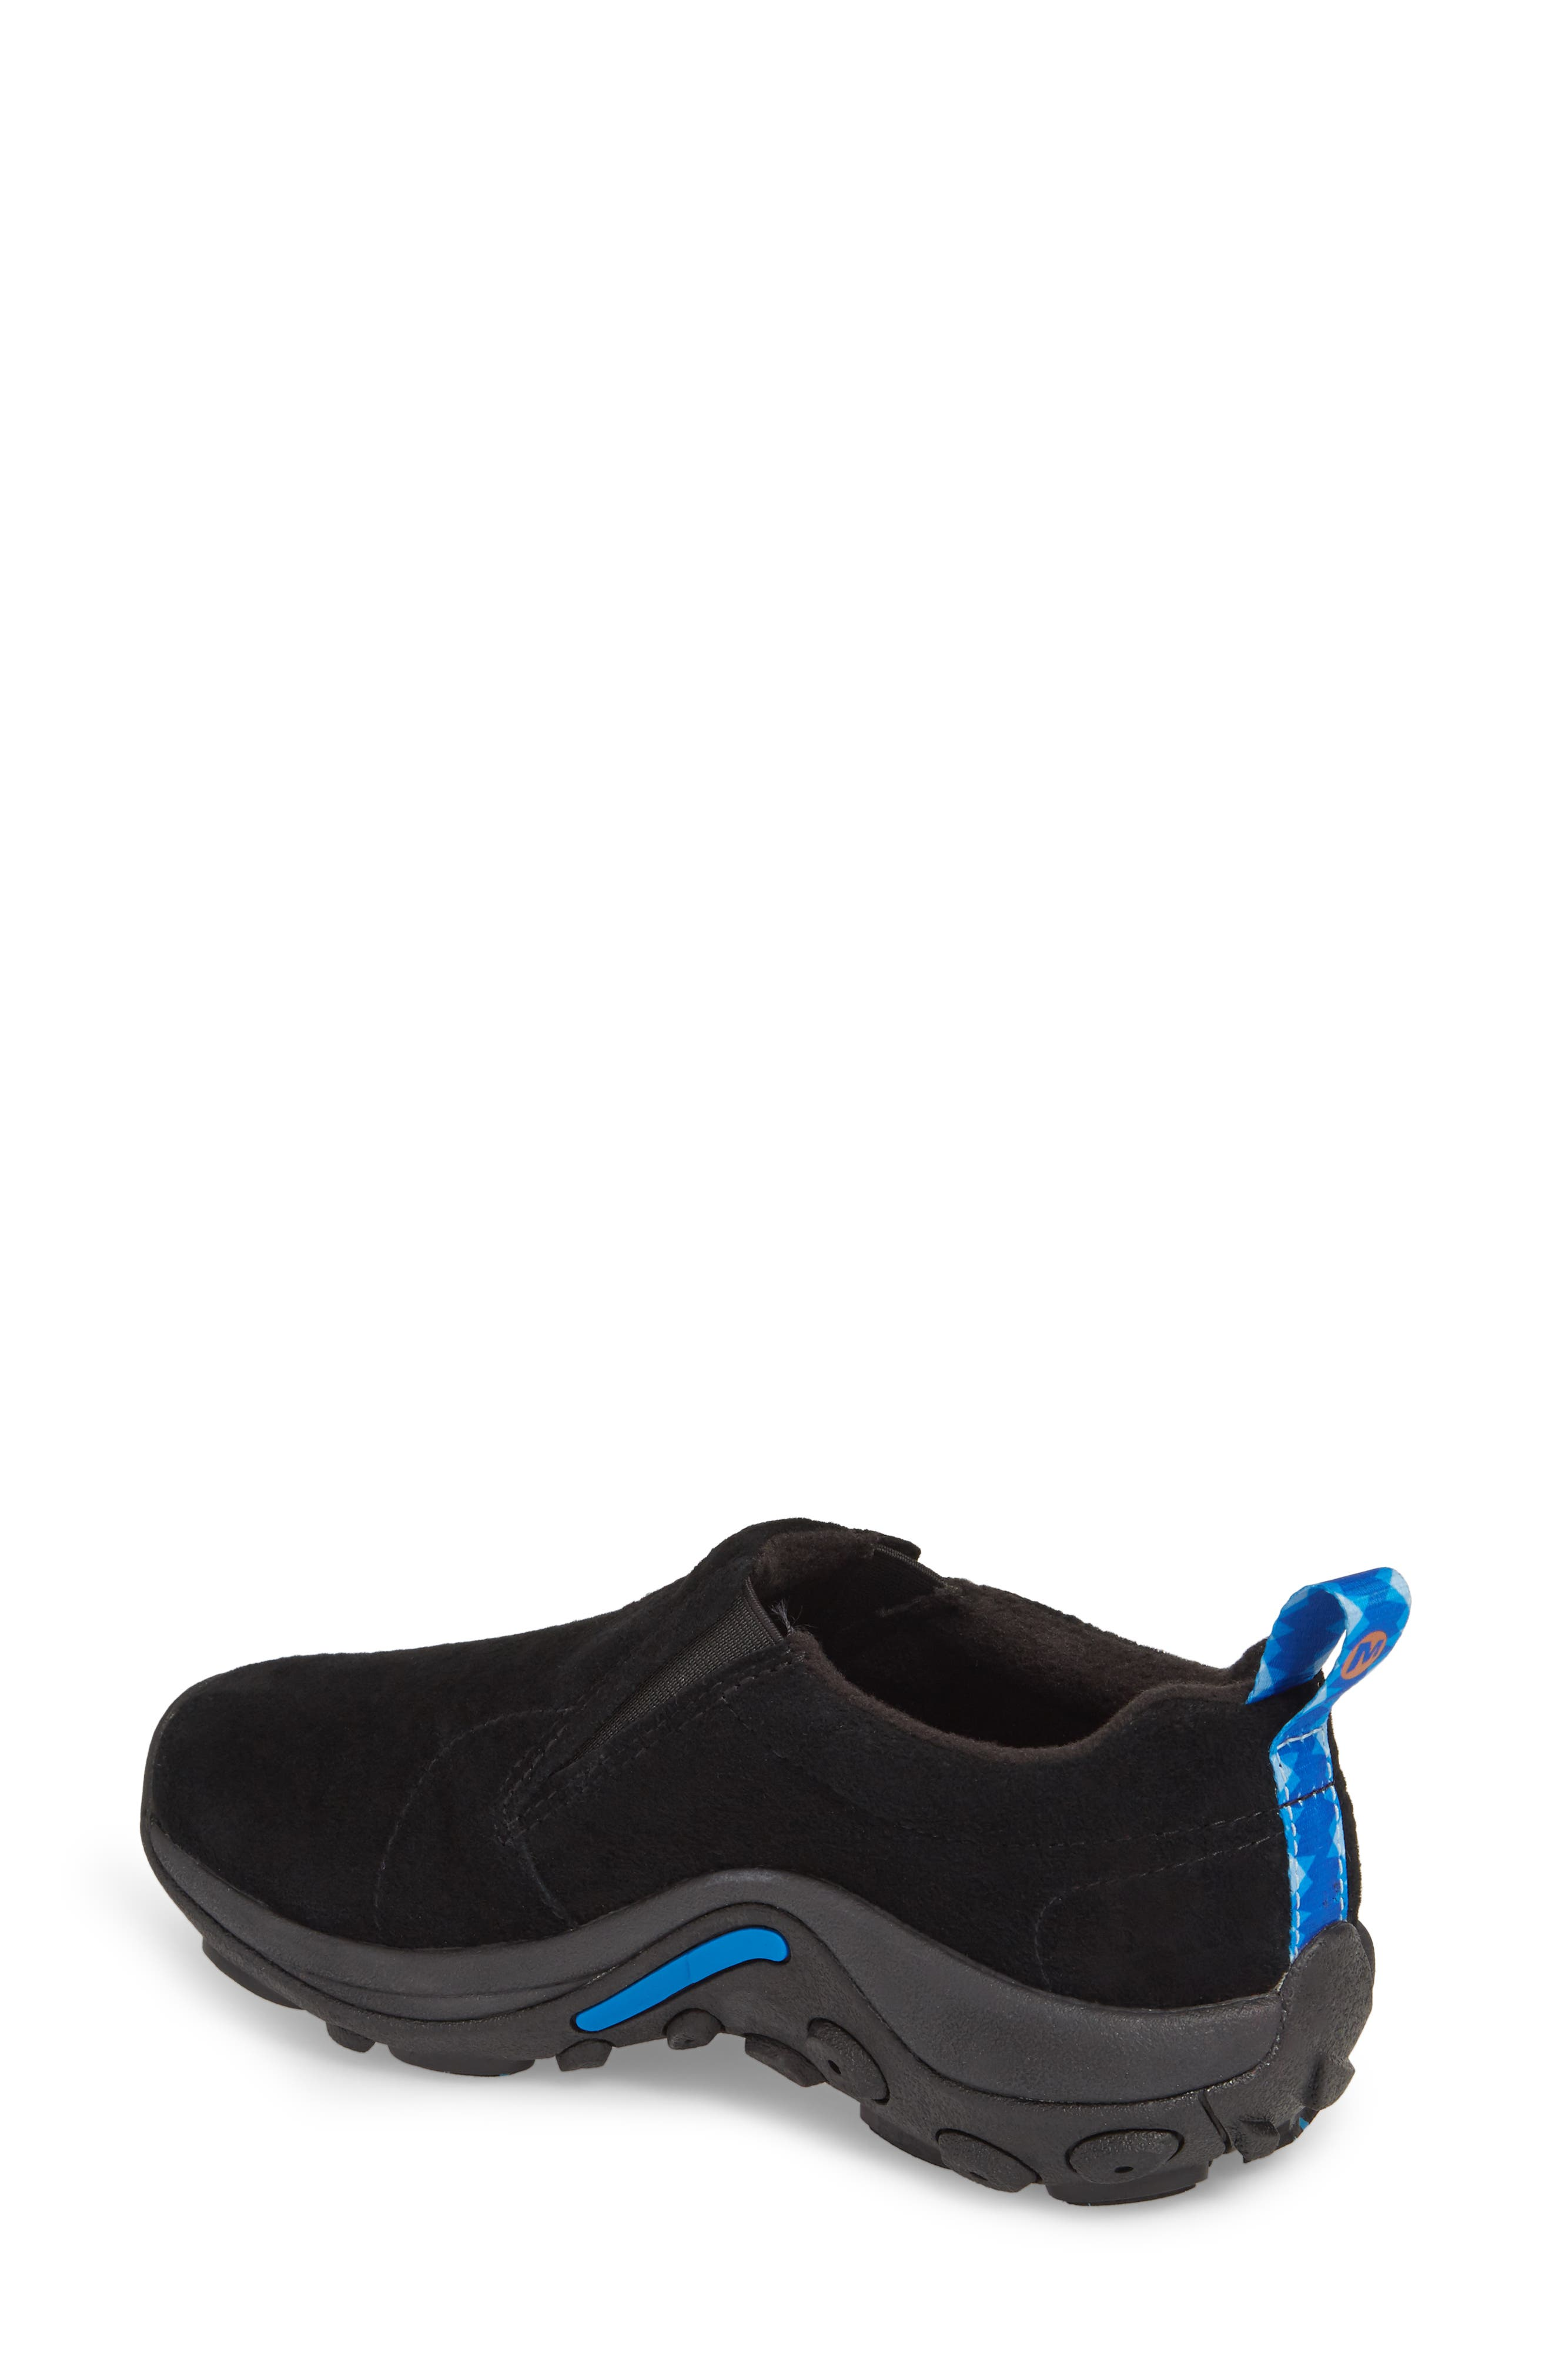 Jungle Moc Ice Waterproof Sneaker,                             Alternate thumbnail 2, color,                             001